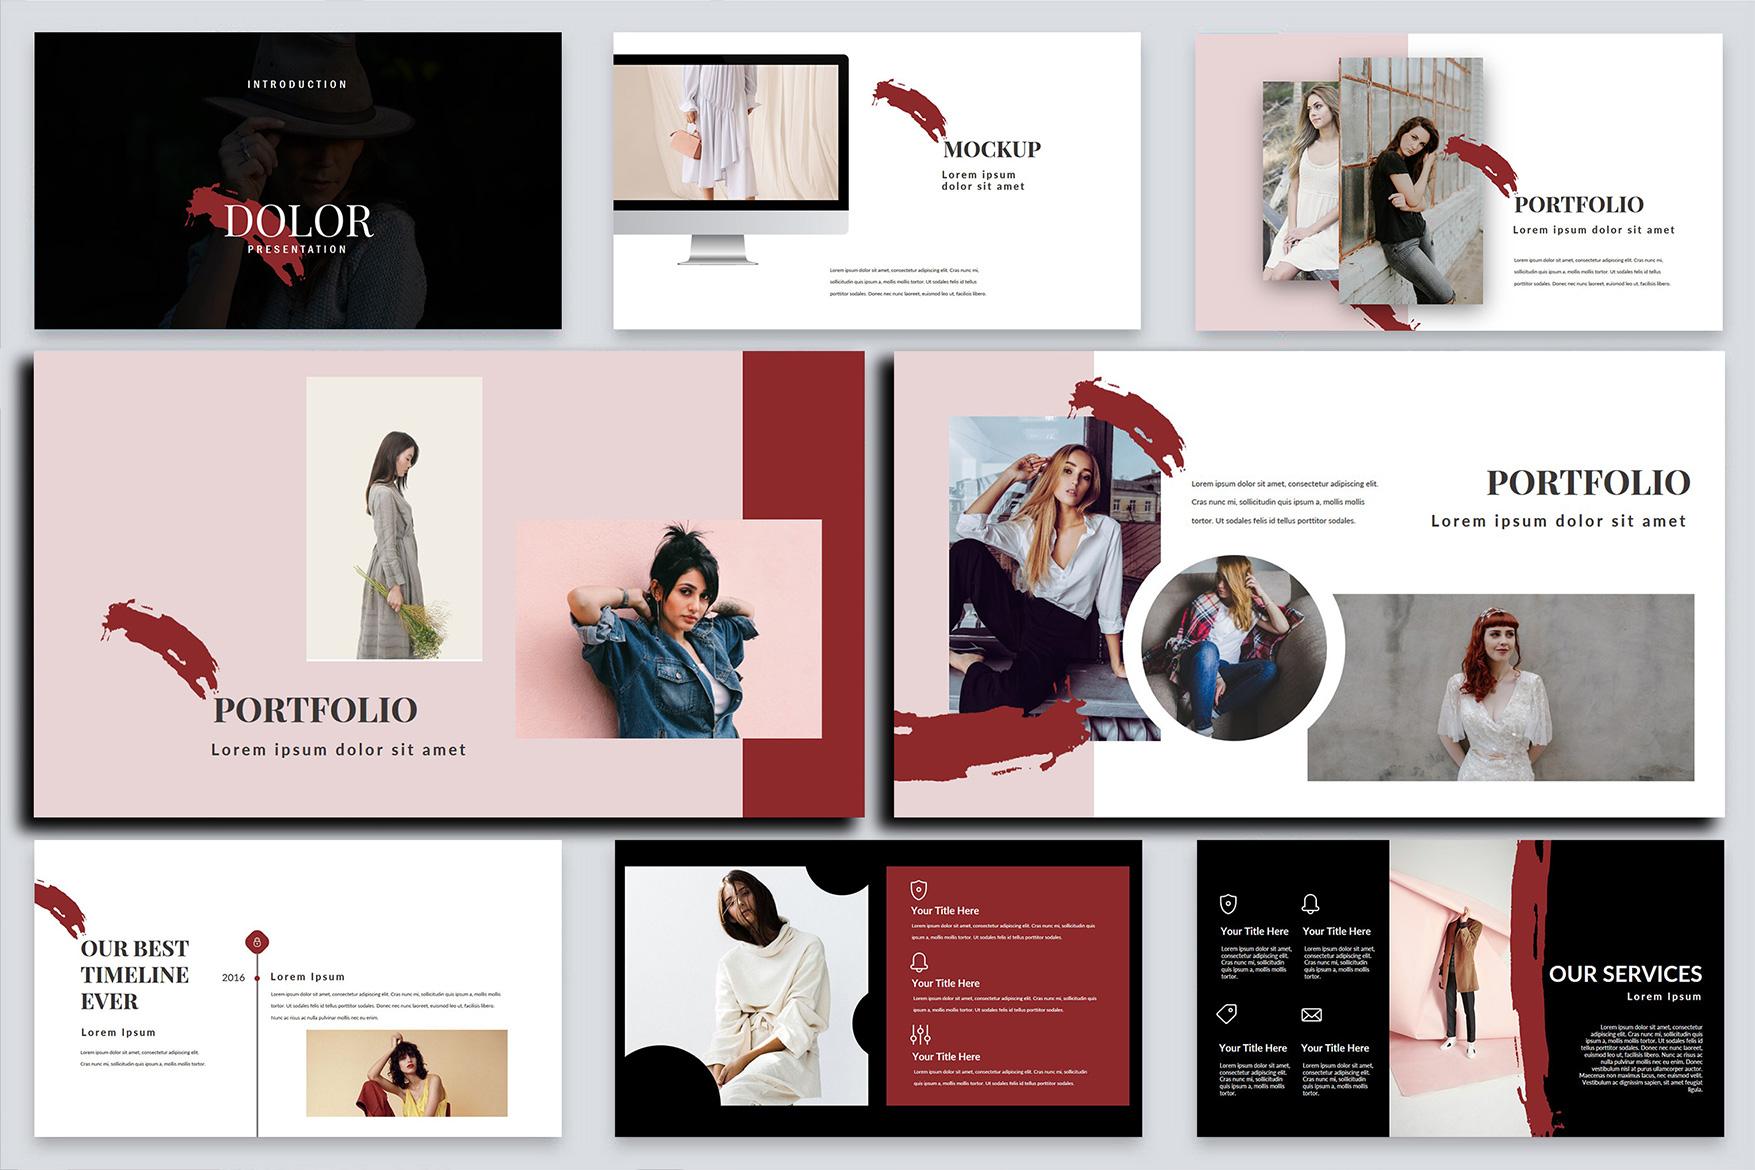 Dolor Stylish PowerPoint example image 6